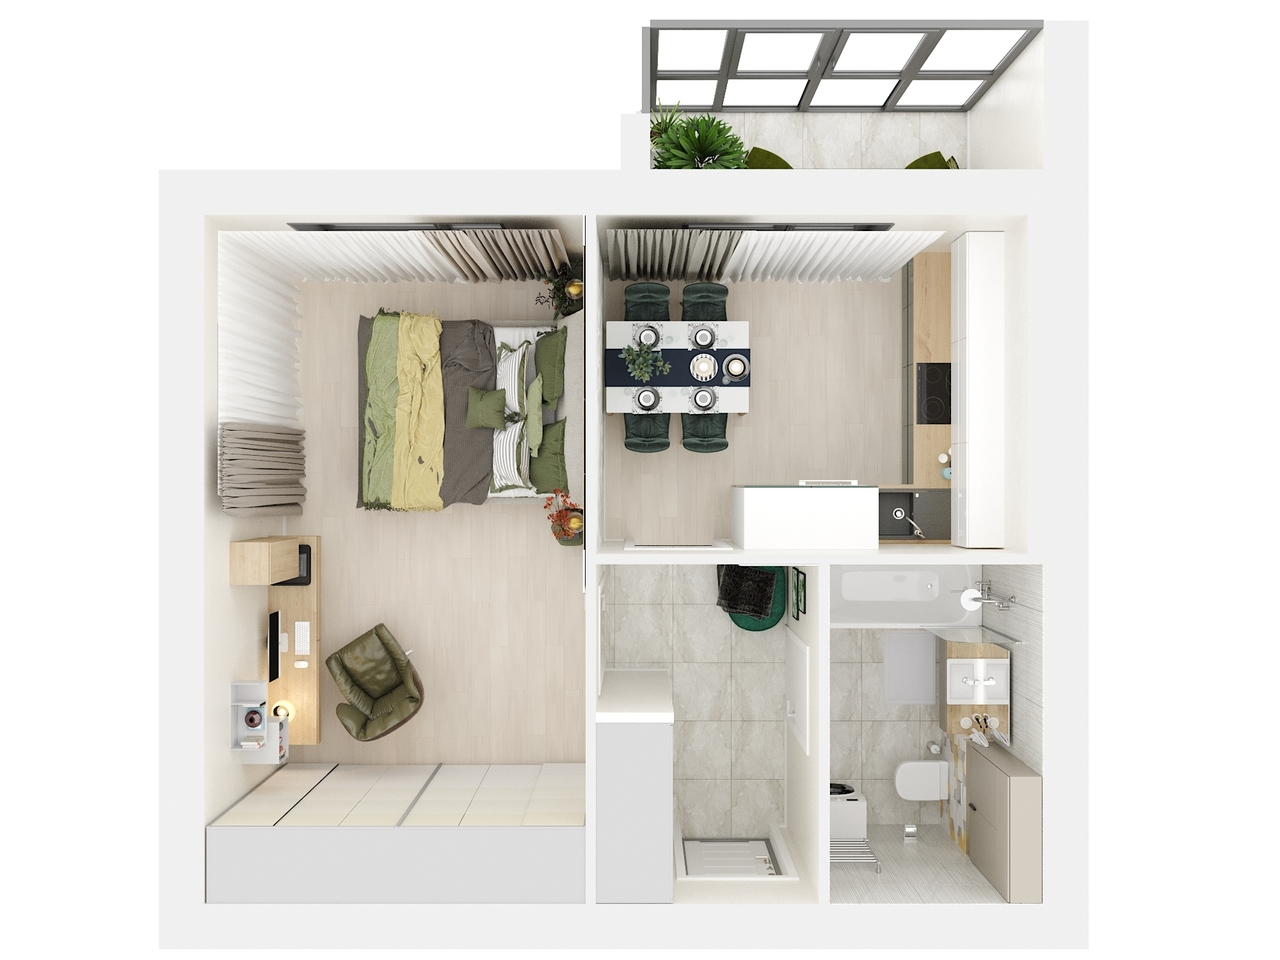 Дом 3 - 1-комнатная квартира №33